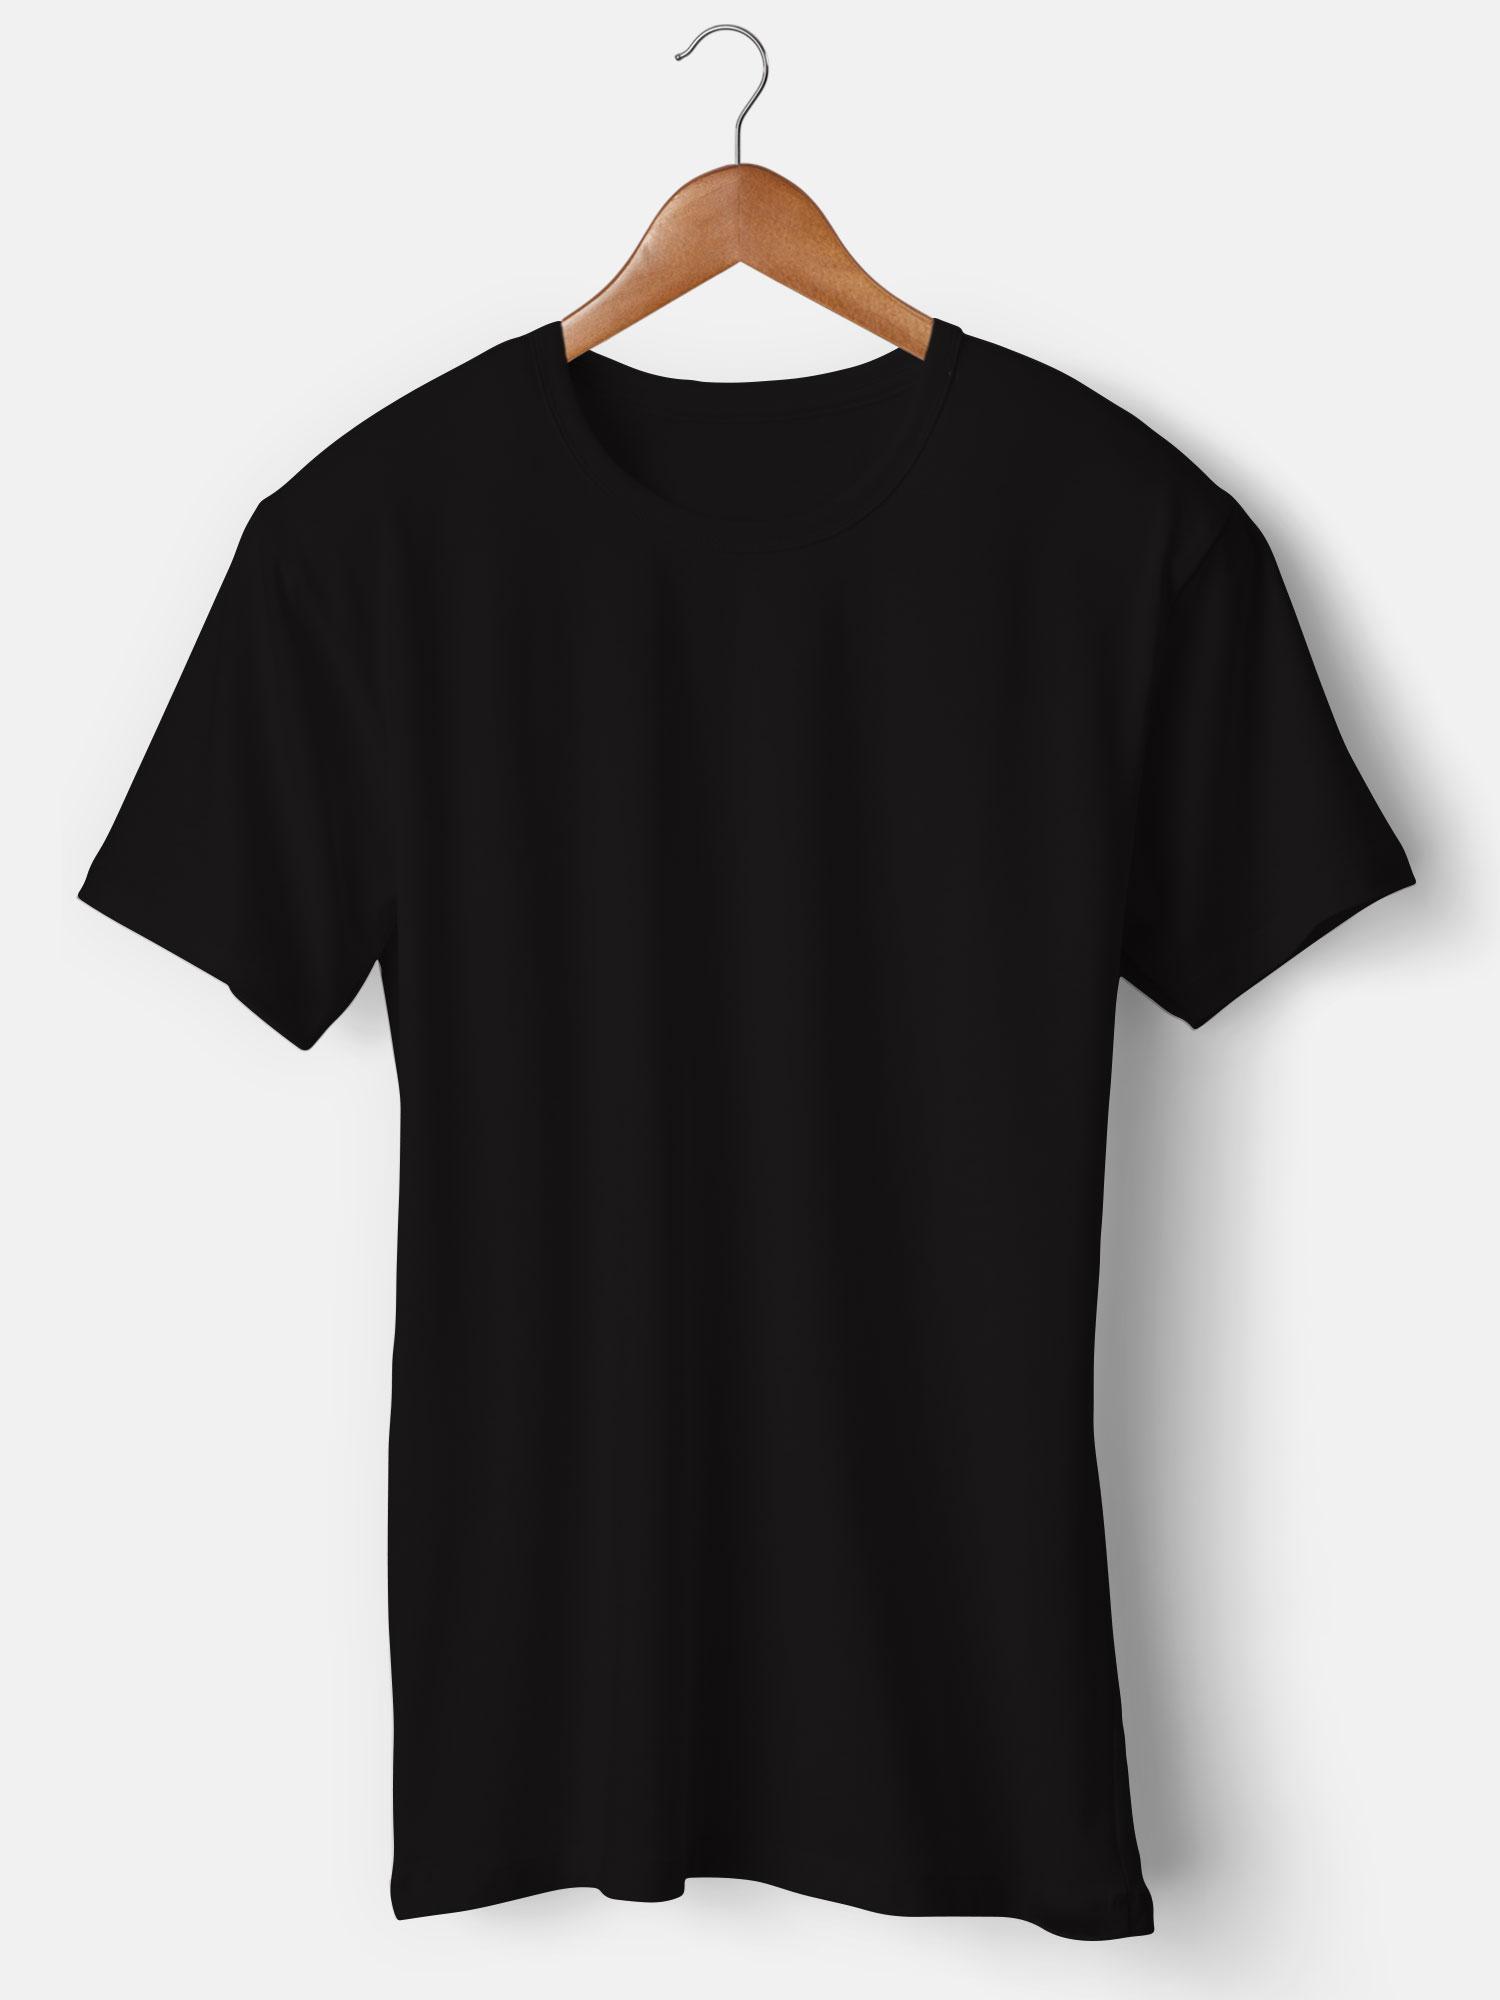 Customized Round Neck Black T-Shirt Printing